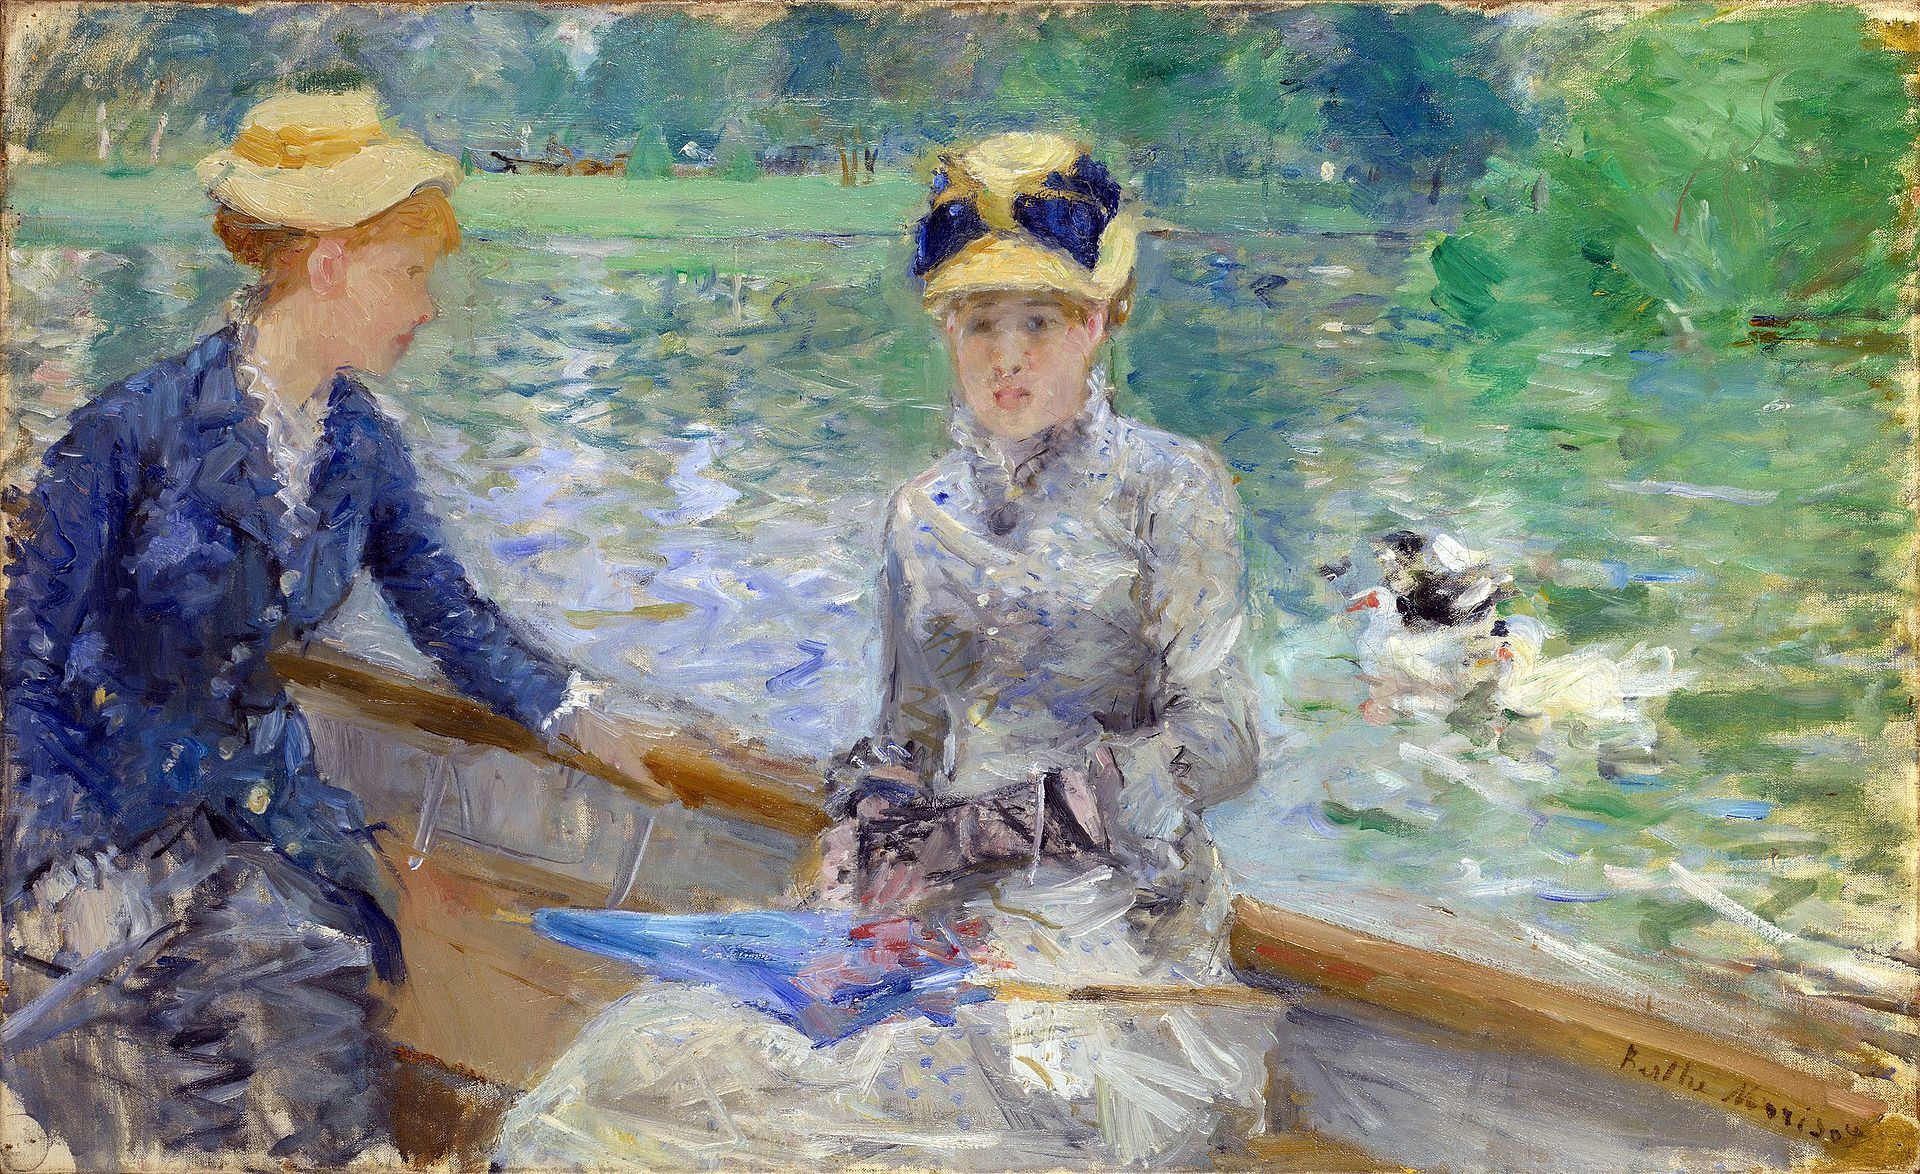 Berthe_Morisot_-_Sommertag_-_1879.jpeg